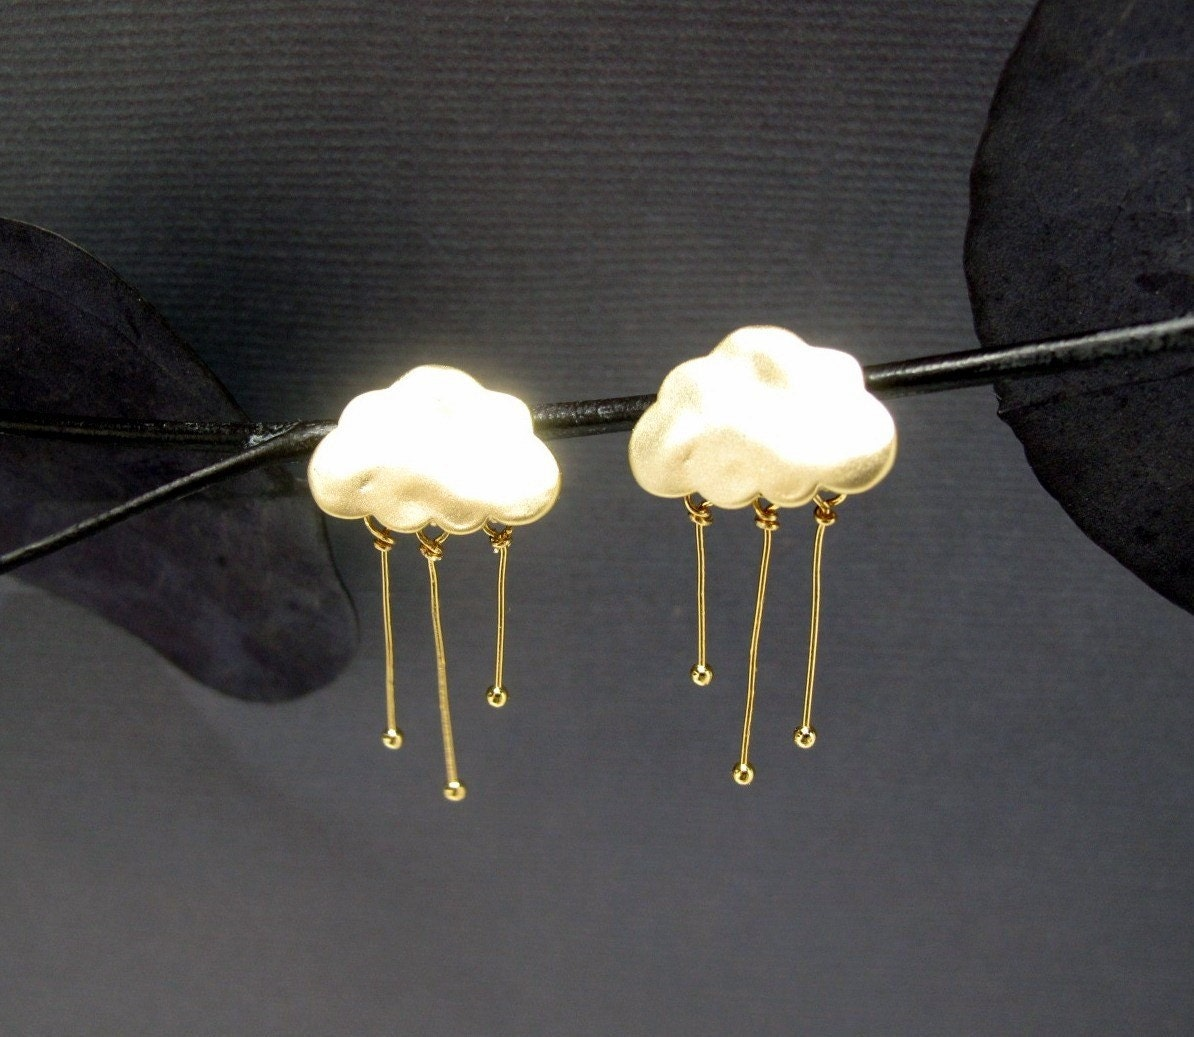 Matte gold Rainy Cloud post earrings